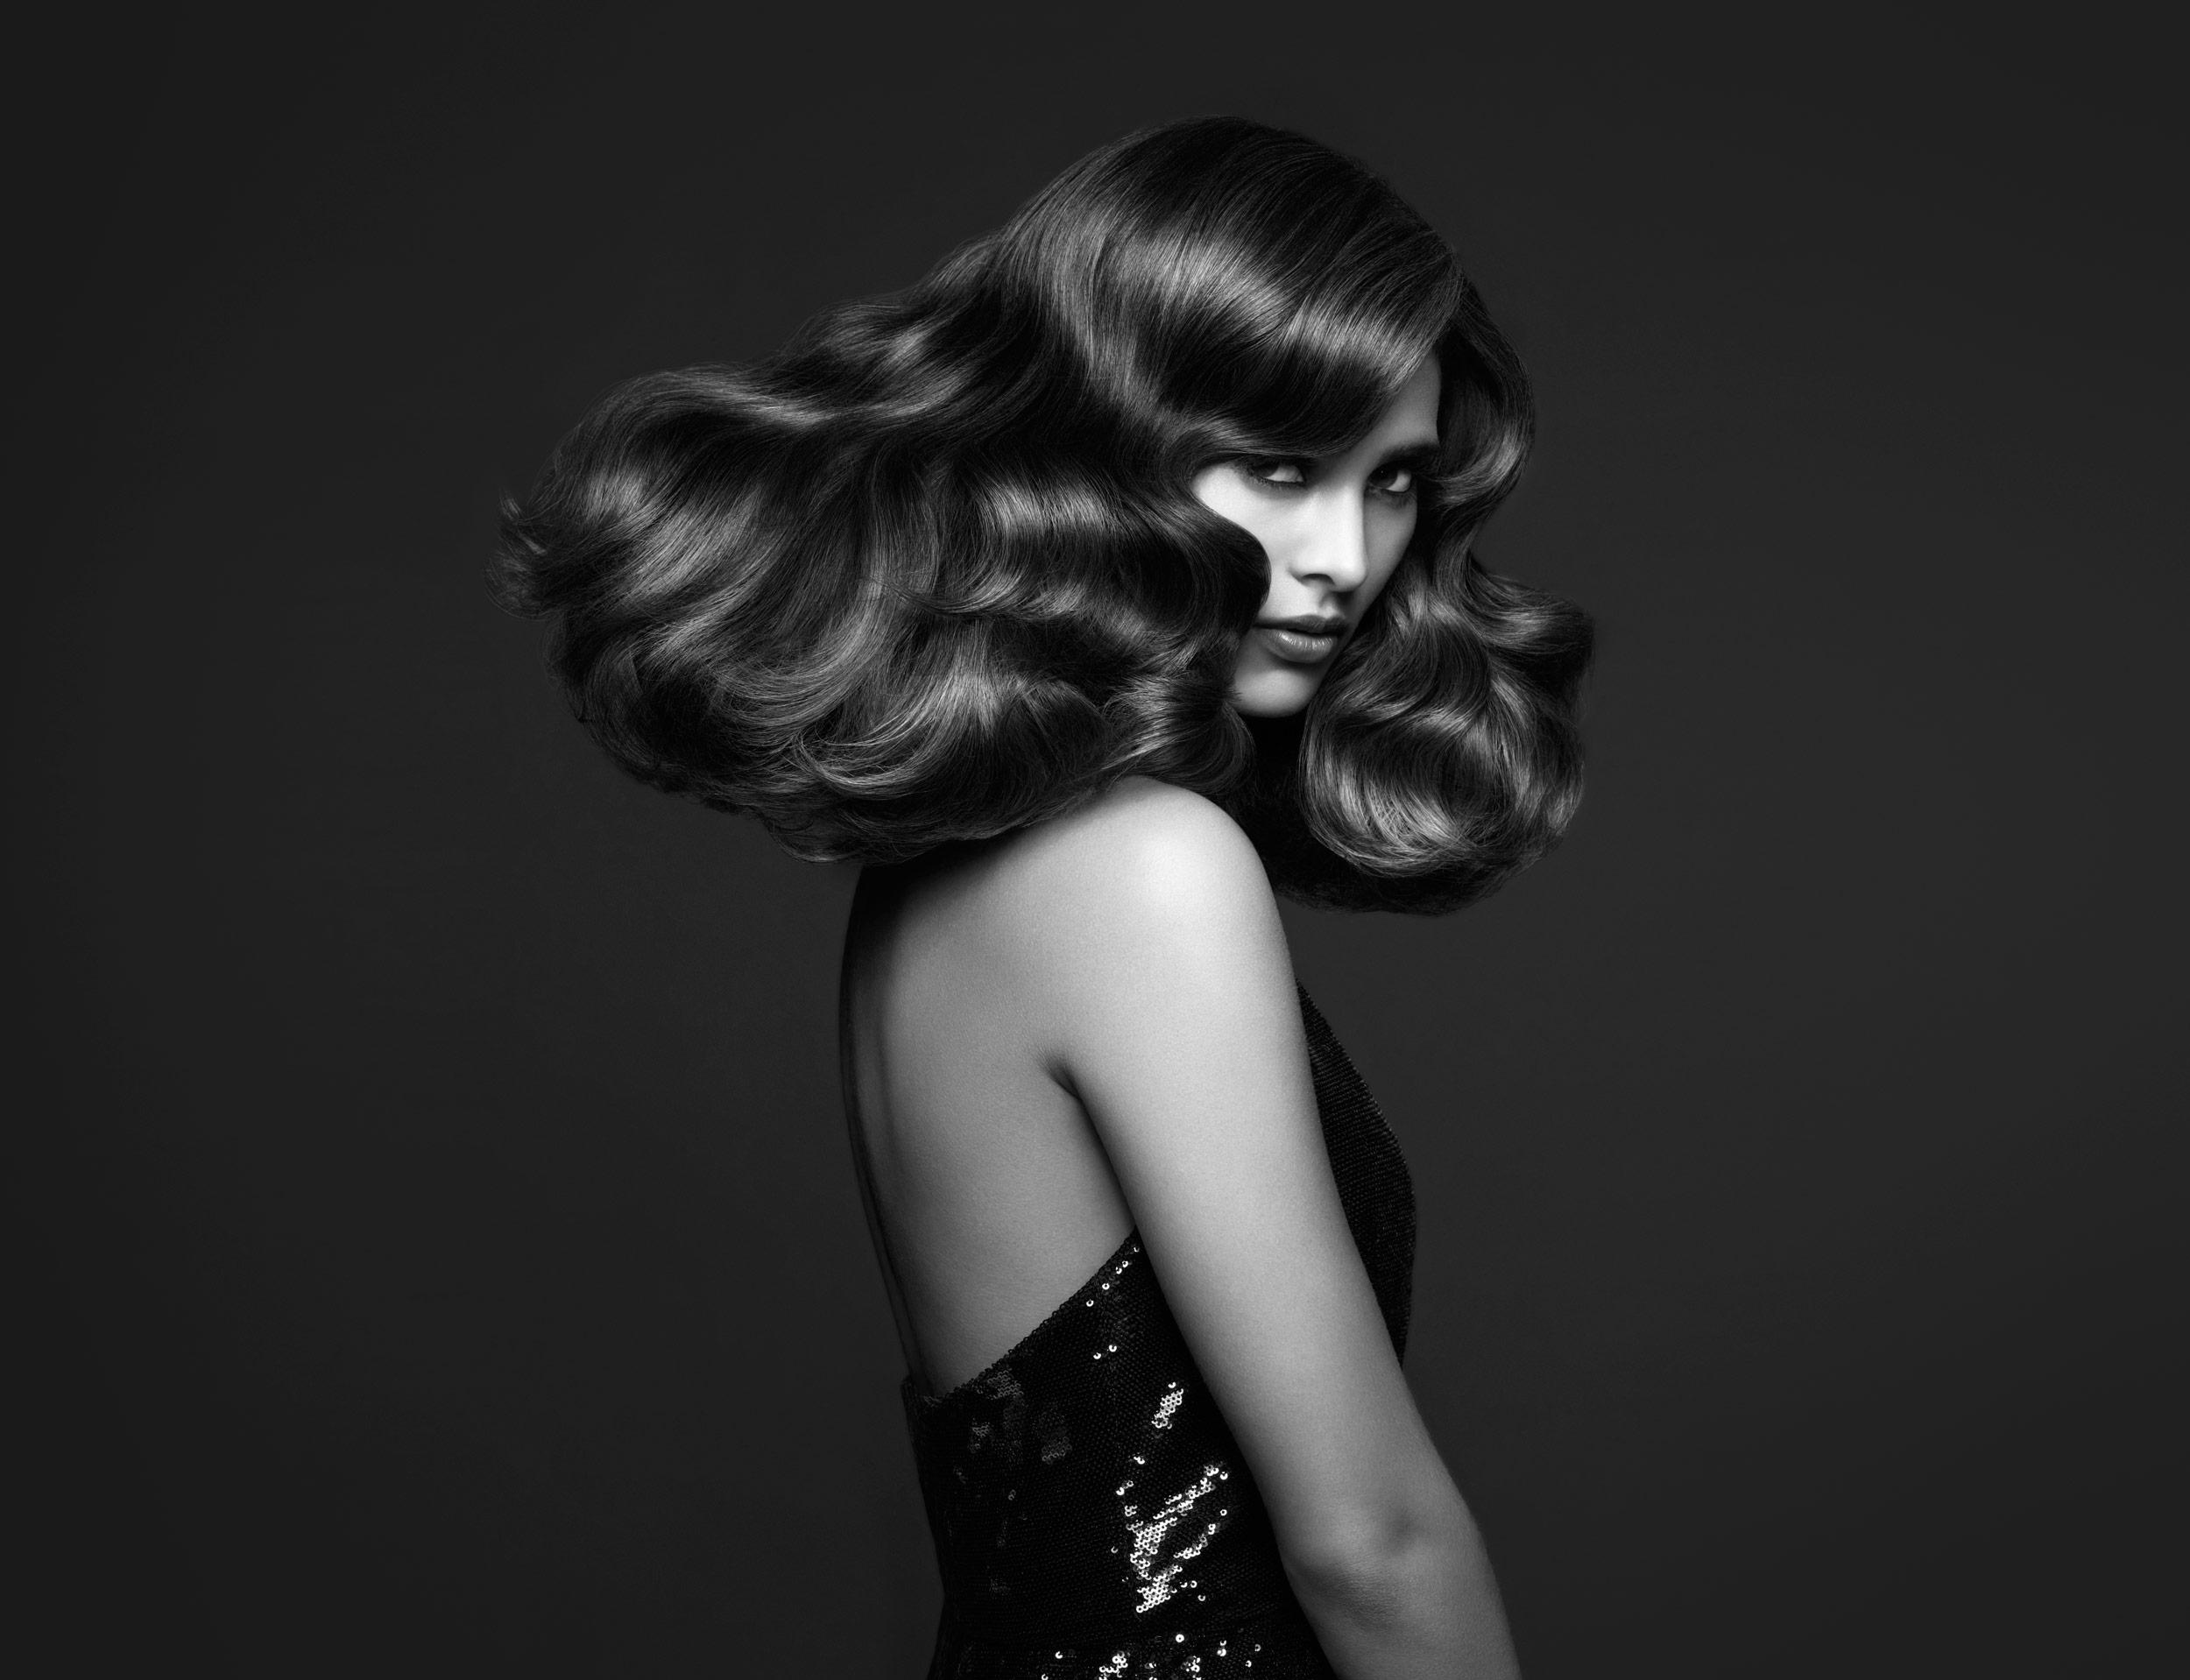 Awapuhi-model-Adriana2-hq